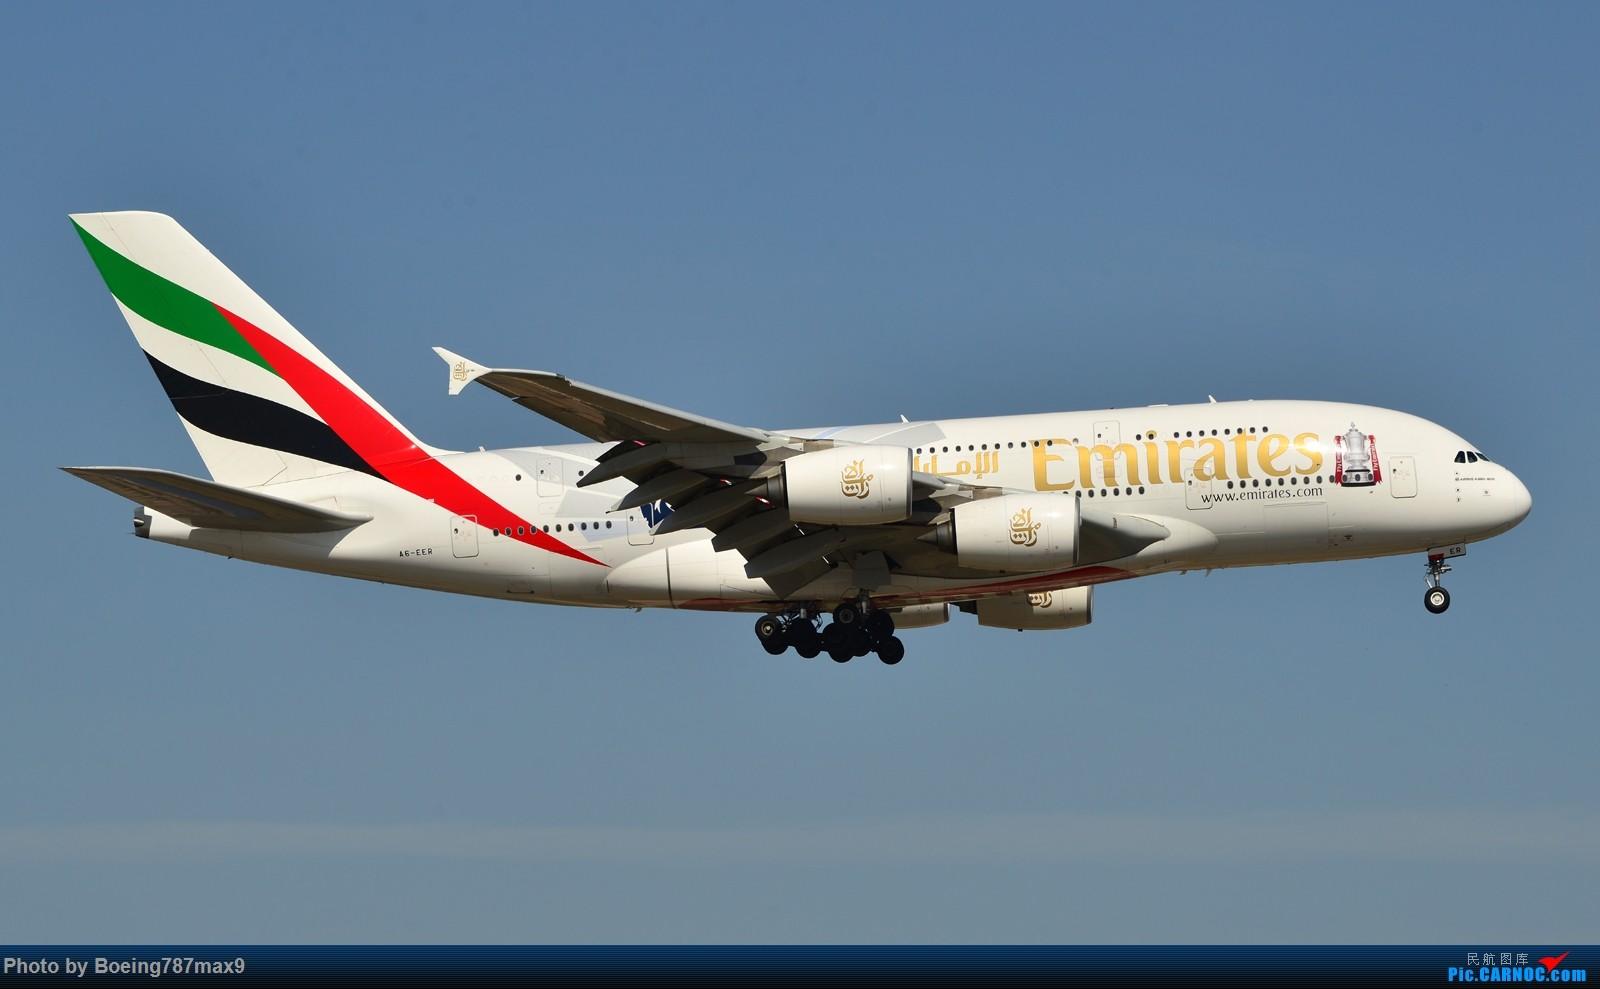 Re:[原创]【PEK】这家或第一次来北京,却正赶上南风。阿联酋380-800总足杯彩绘机『1600*高清大图』 AIRBUS A380-800 A6-EER 中国北京首都国际机场